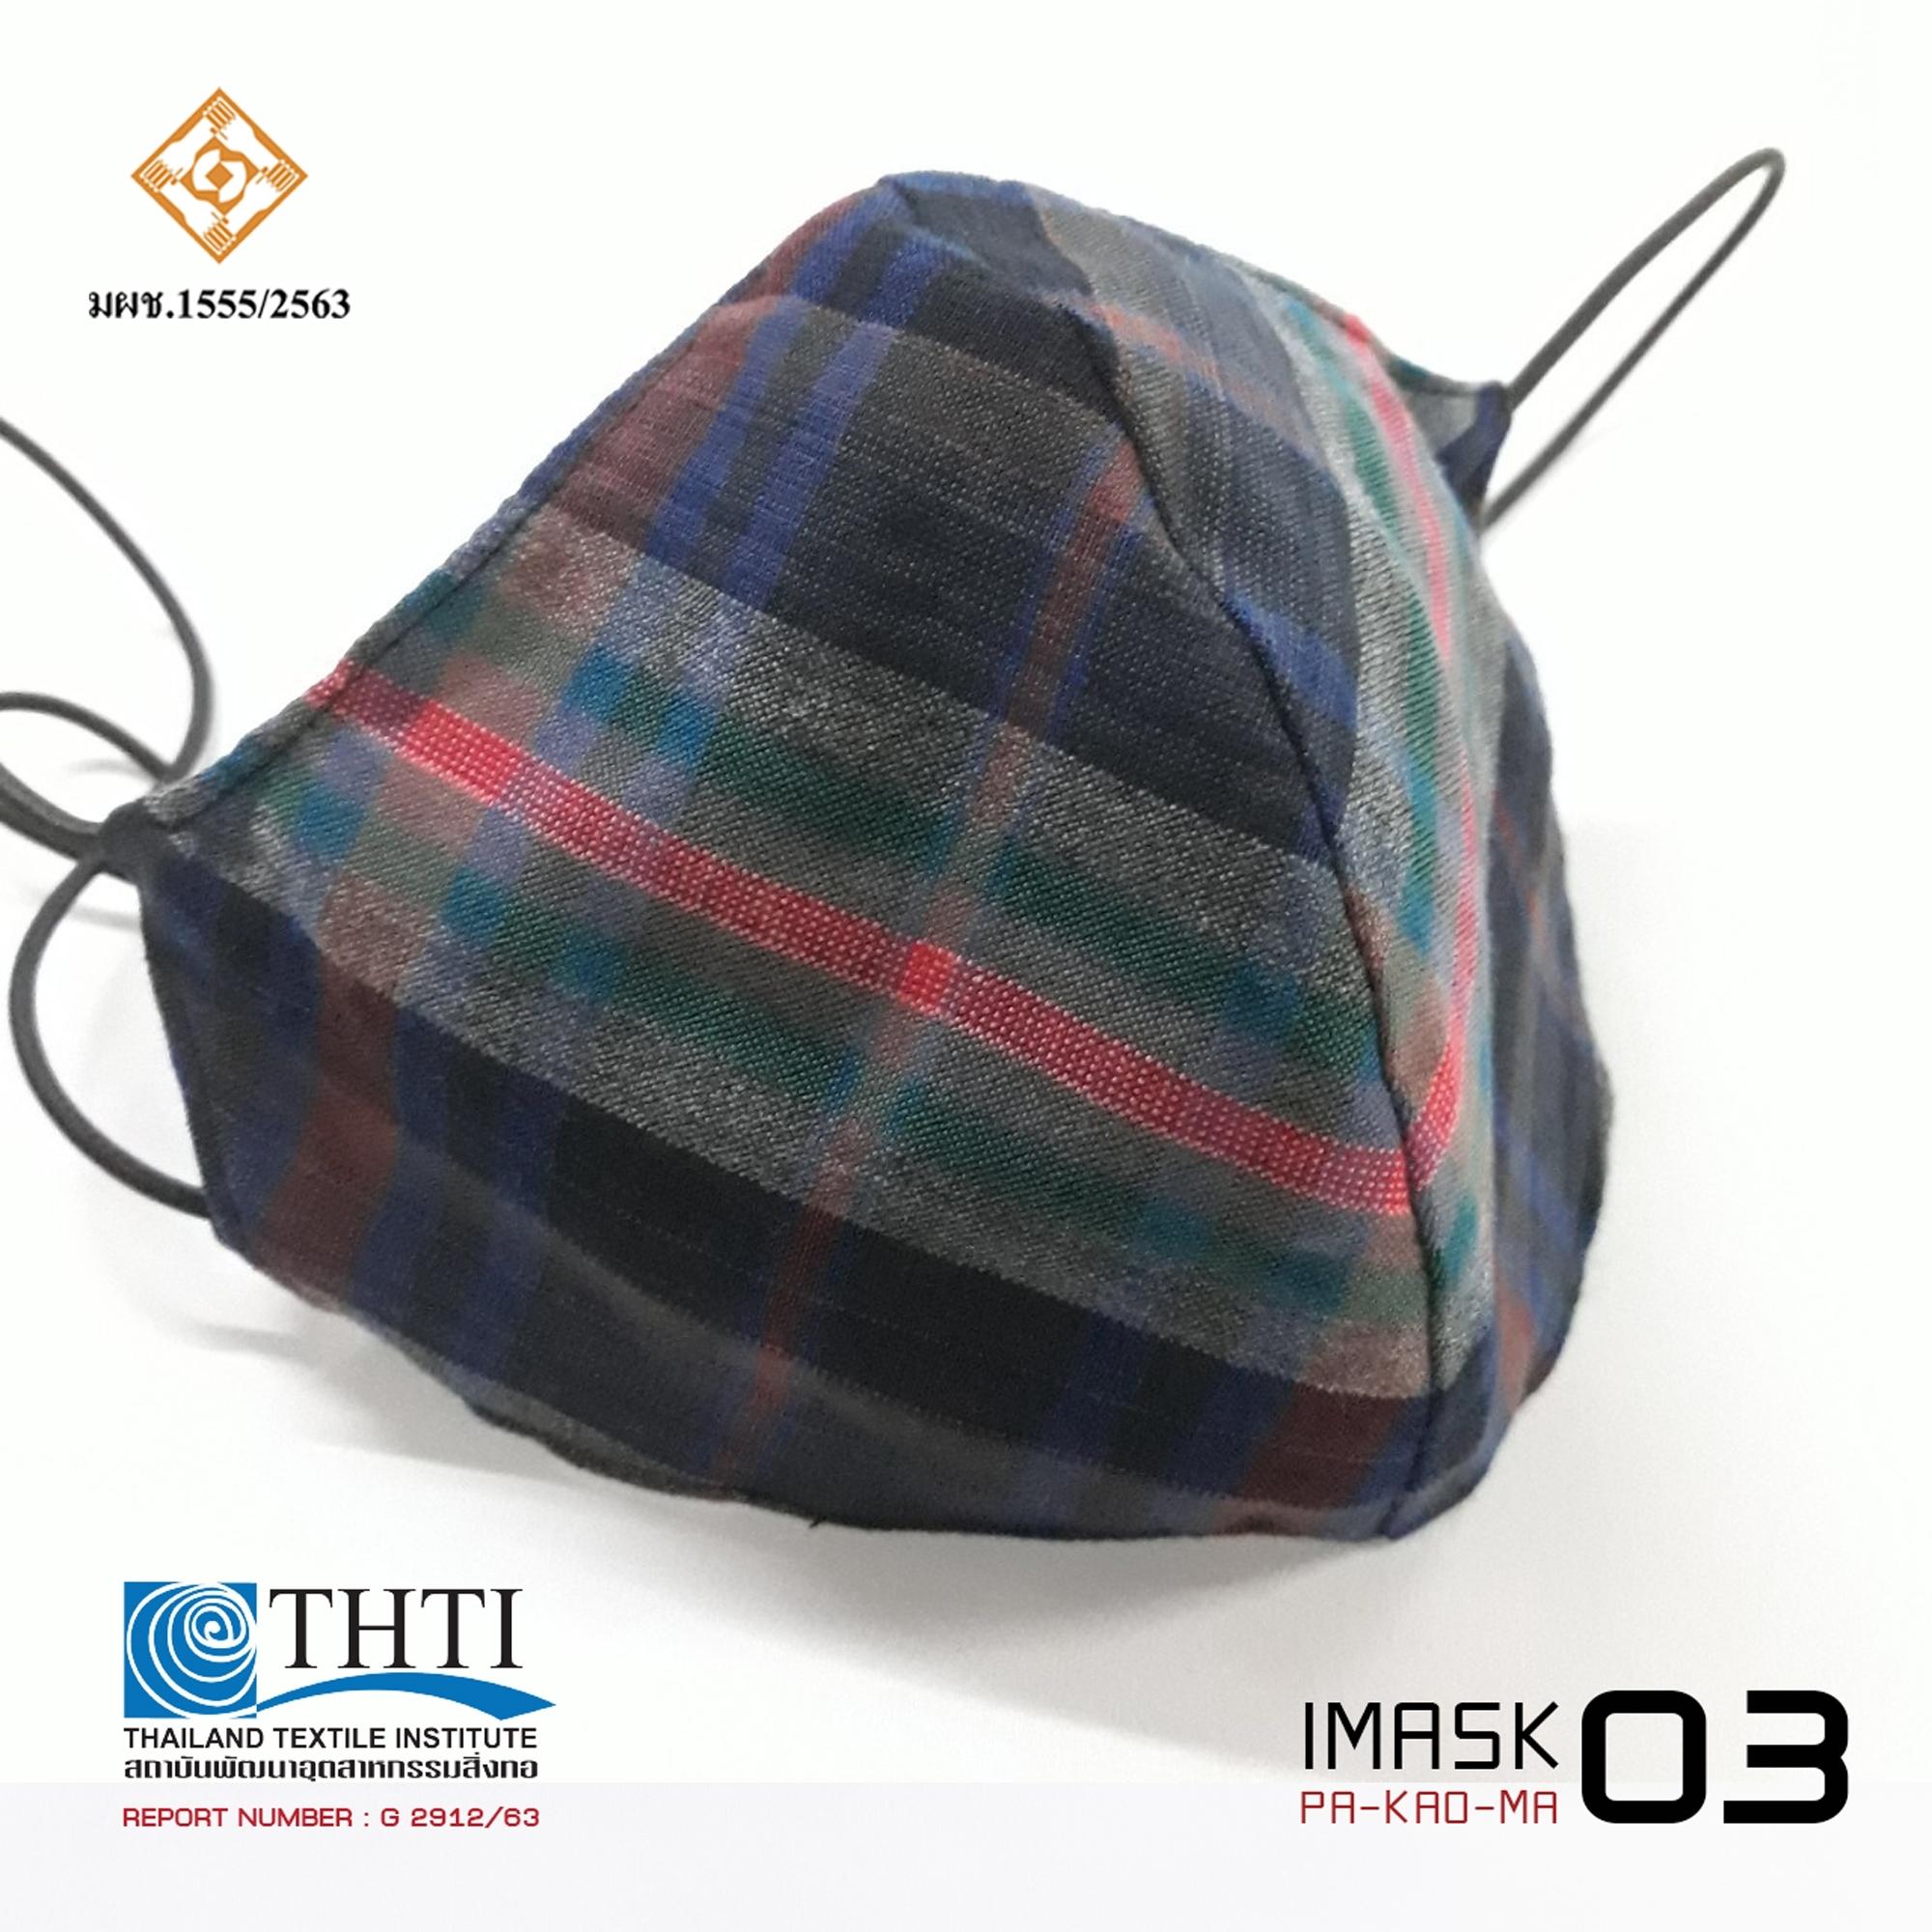 Mask IMPANI 03